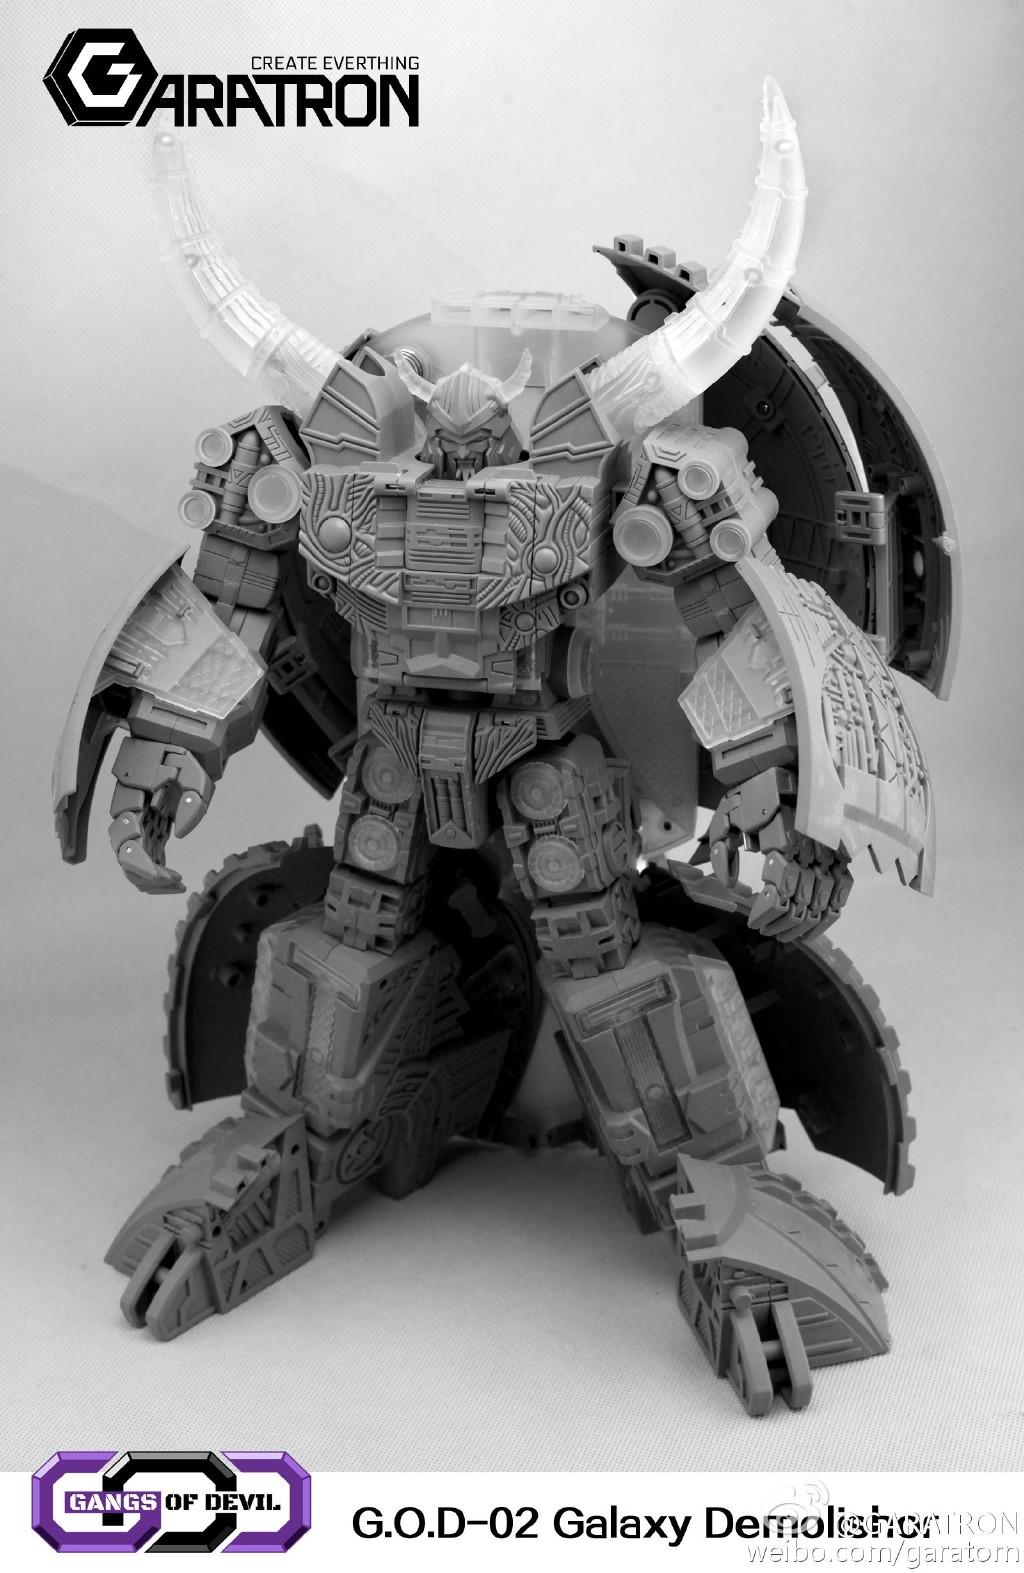 [Garatron] Produit Tiers - Gangs Of Devils G.O.D-02 Galaxy Demolishor - aka Unicron (Beast Wars Neo) Uni8